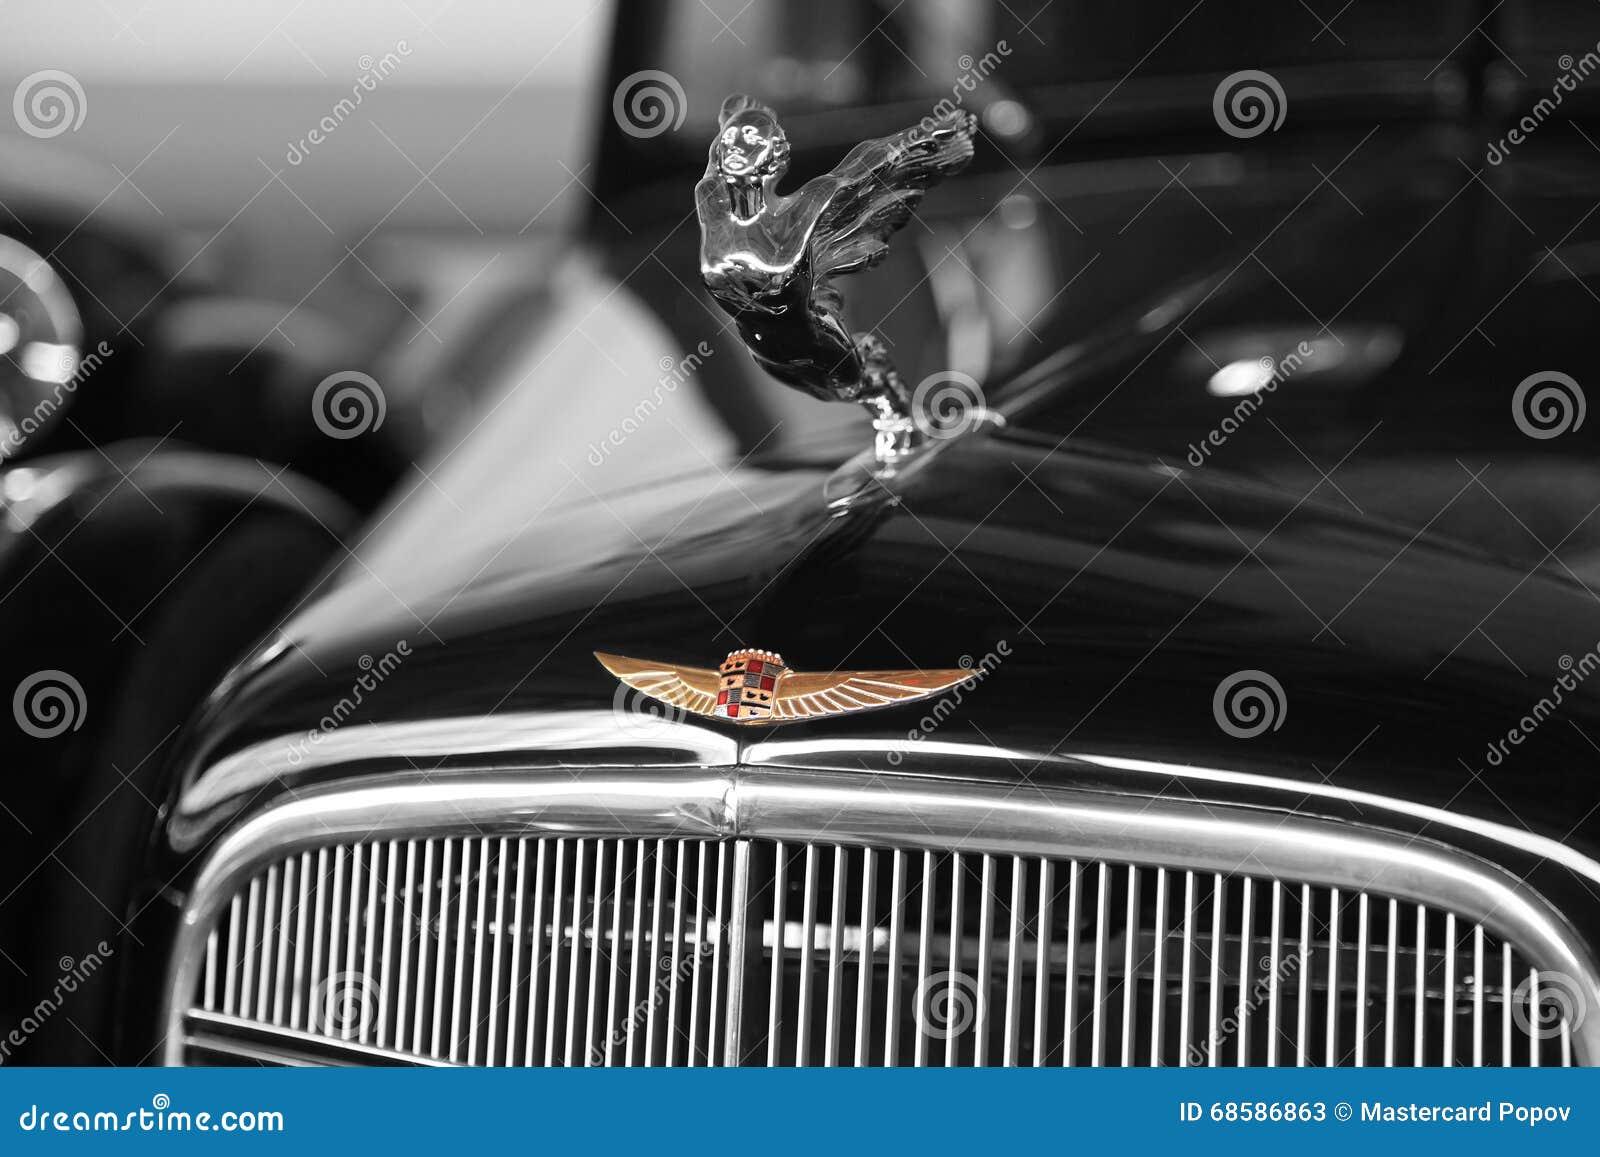 Vintage Car Logo Editorial Stock Photo Image Of Details 68586863